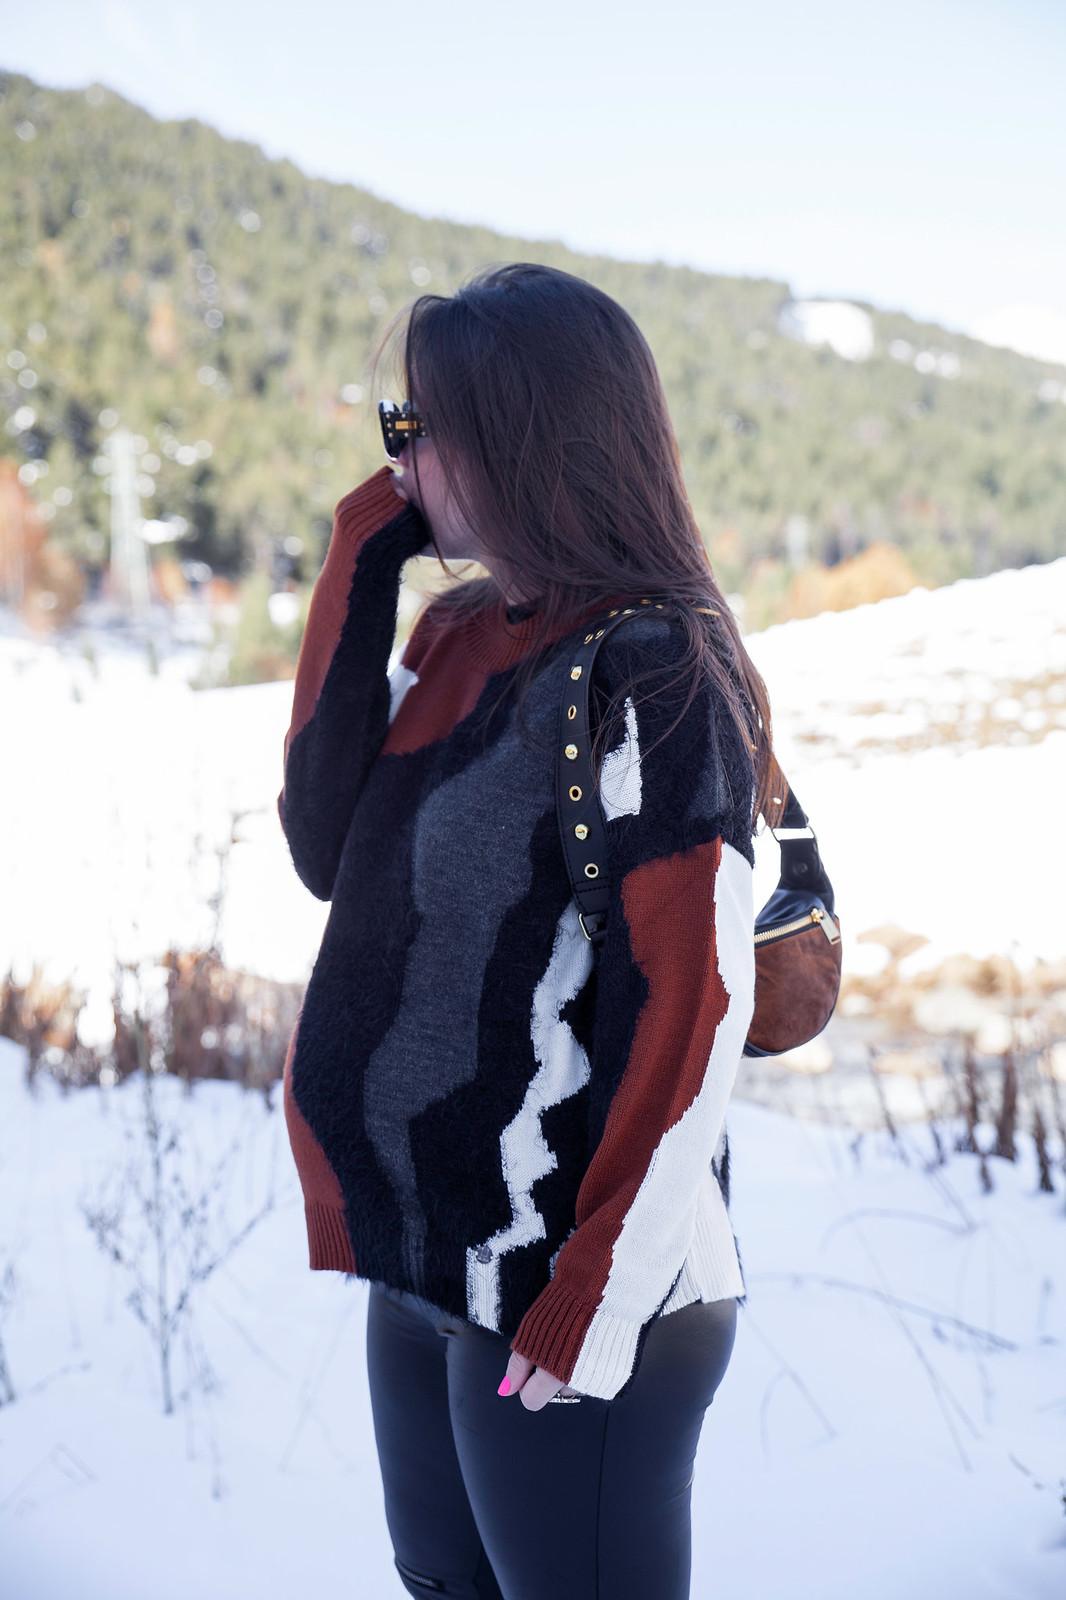 03_combinar_jersey_marron_outfit_nieve_embarazada_theguestgirl_embarazo_33semanas_pregnant_style_influencer_barcelona